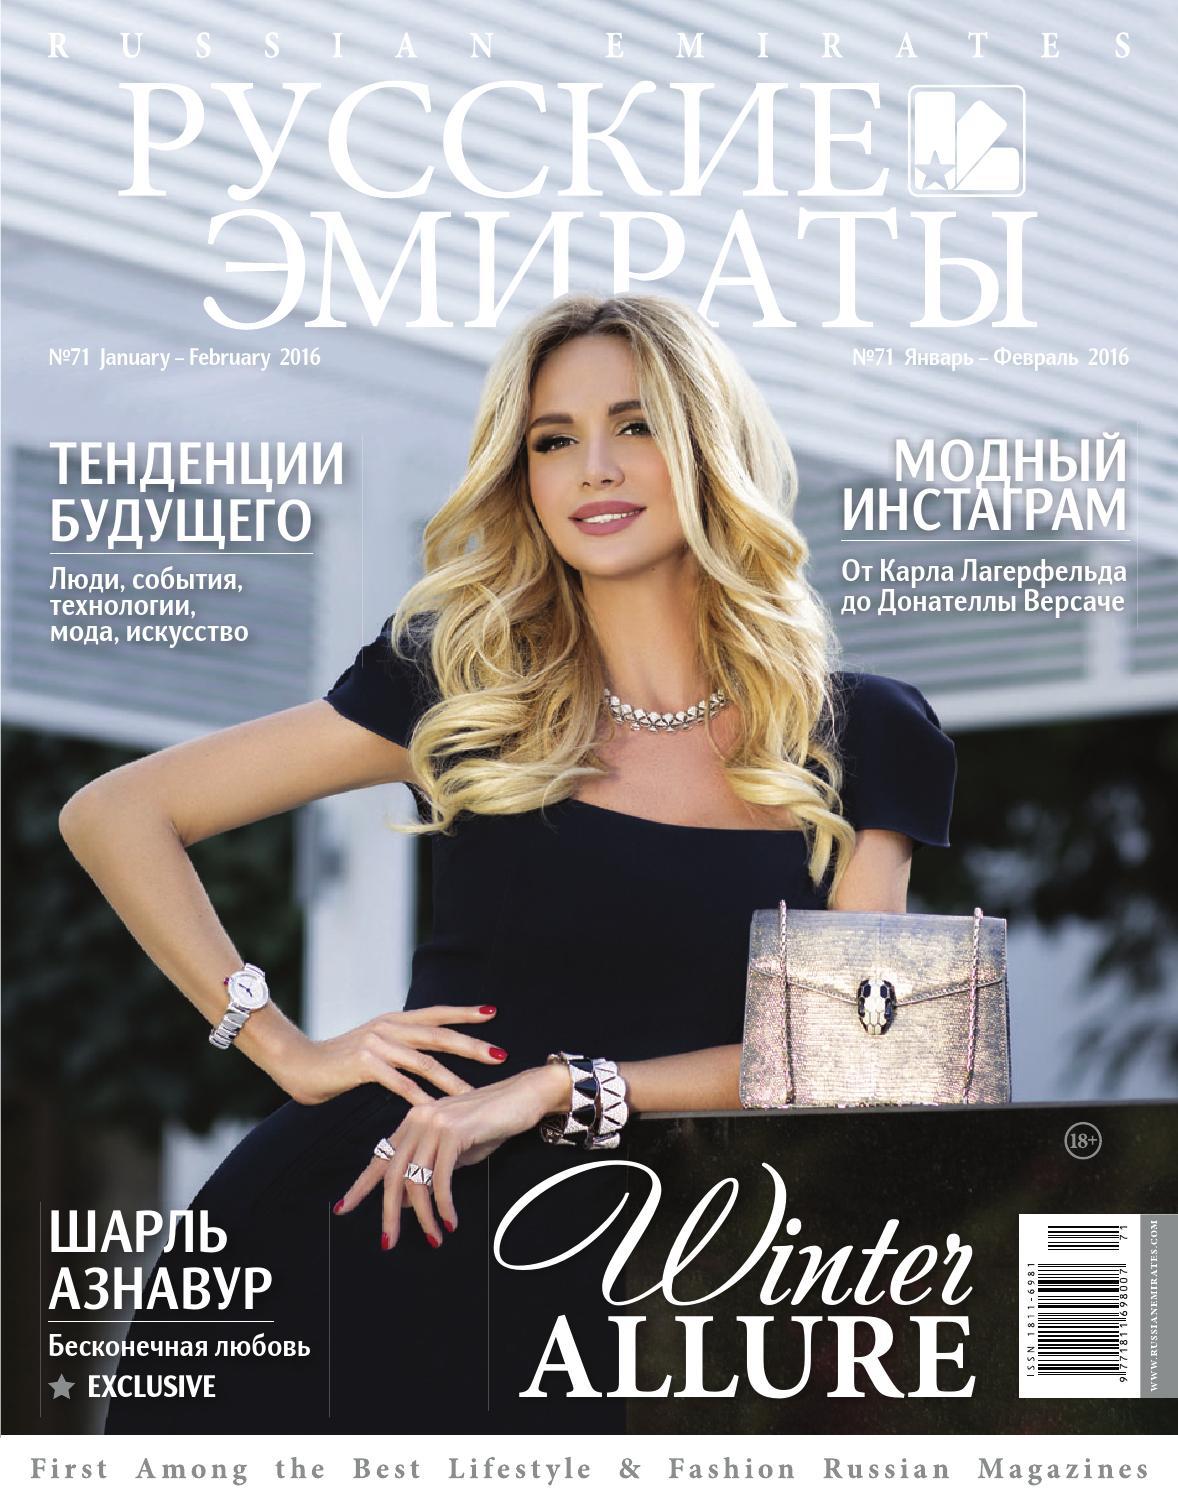 Russian Emirates Magazine     71   Jan - Feb 2016 by Russian Emirates -  issuu 10cb9cbfa64